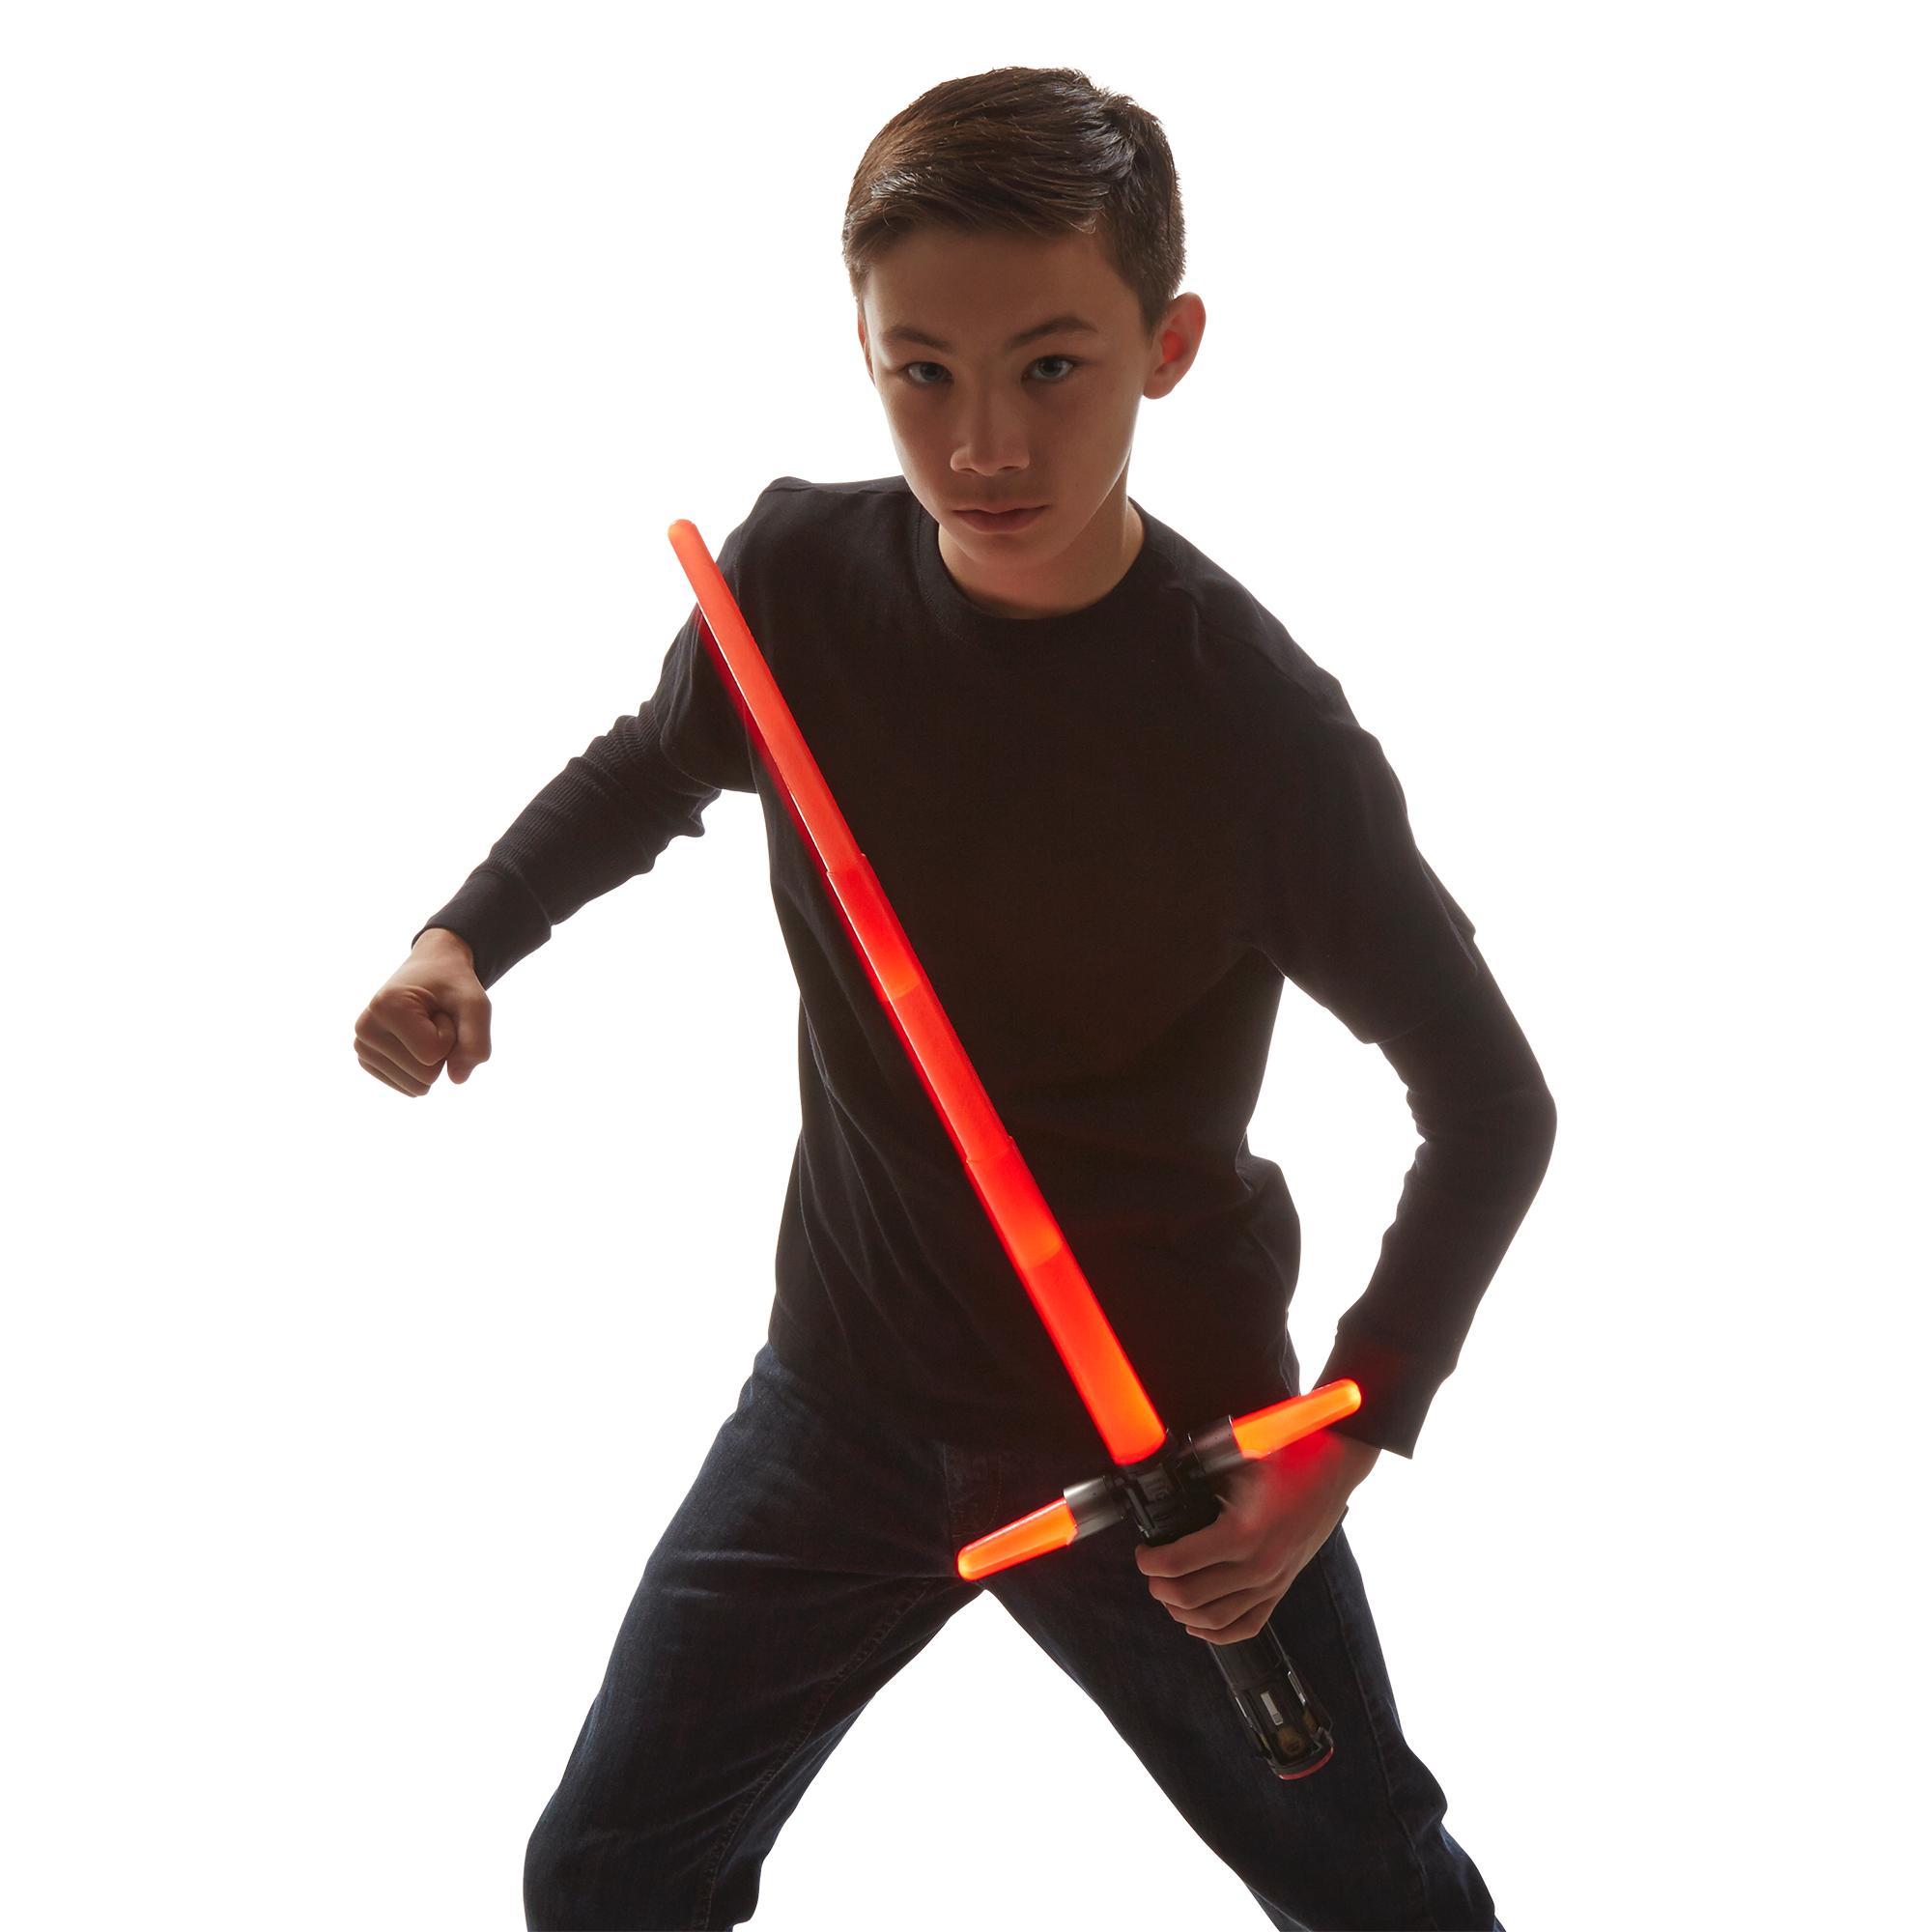 Star-Wars-The-Force-Awakens-Kylo-Ren-Deluxe-Electronic-Lightsaber thumbnail 3